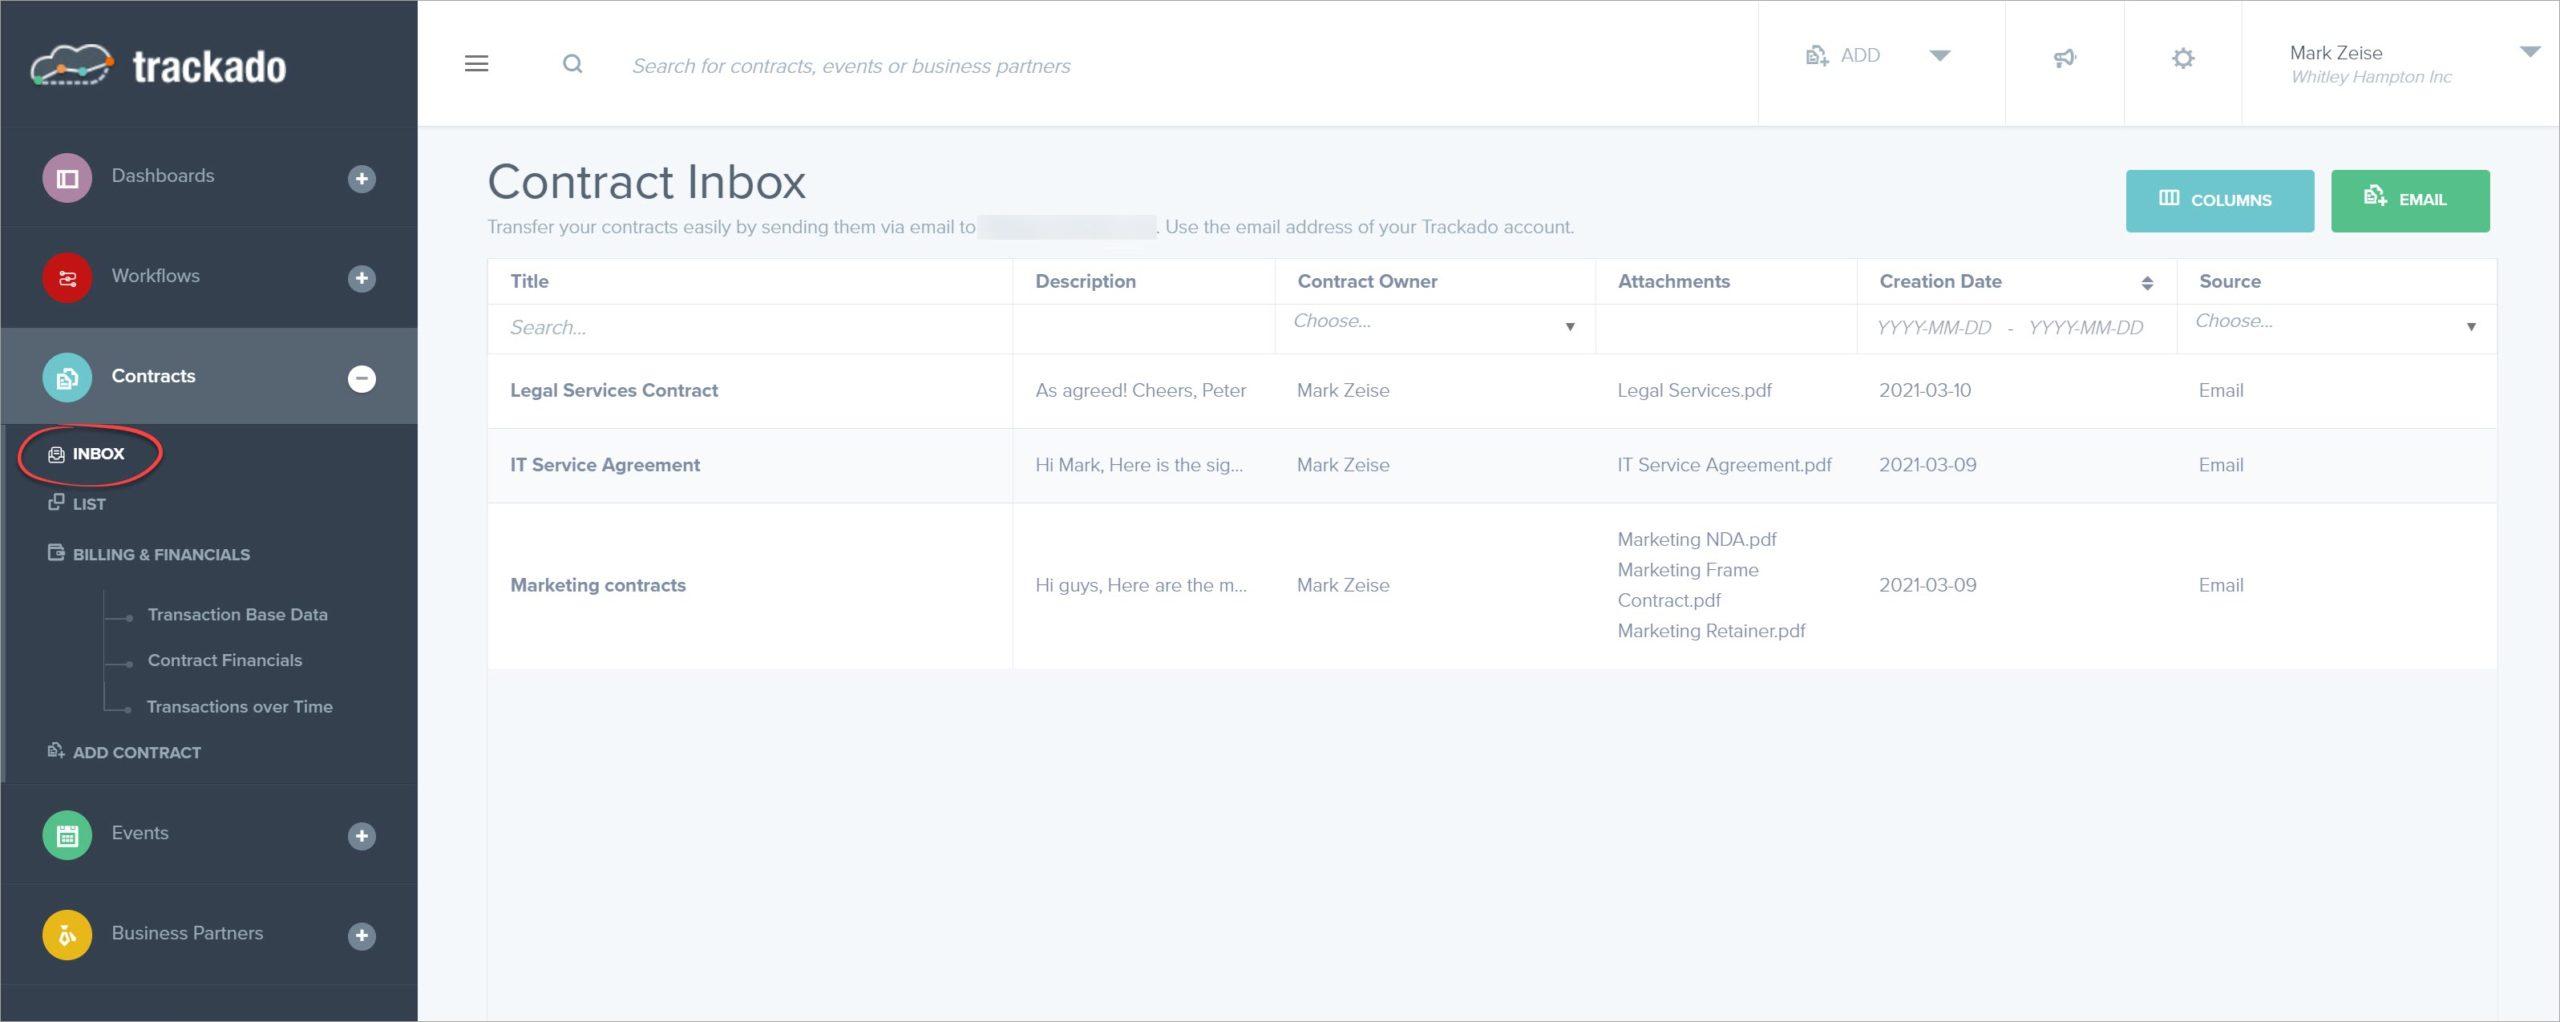 Contract Inbox